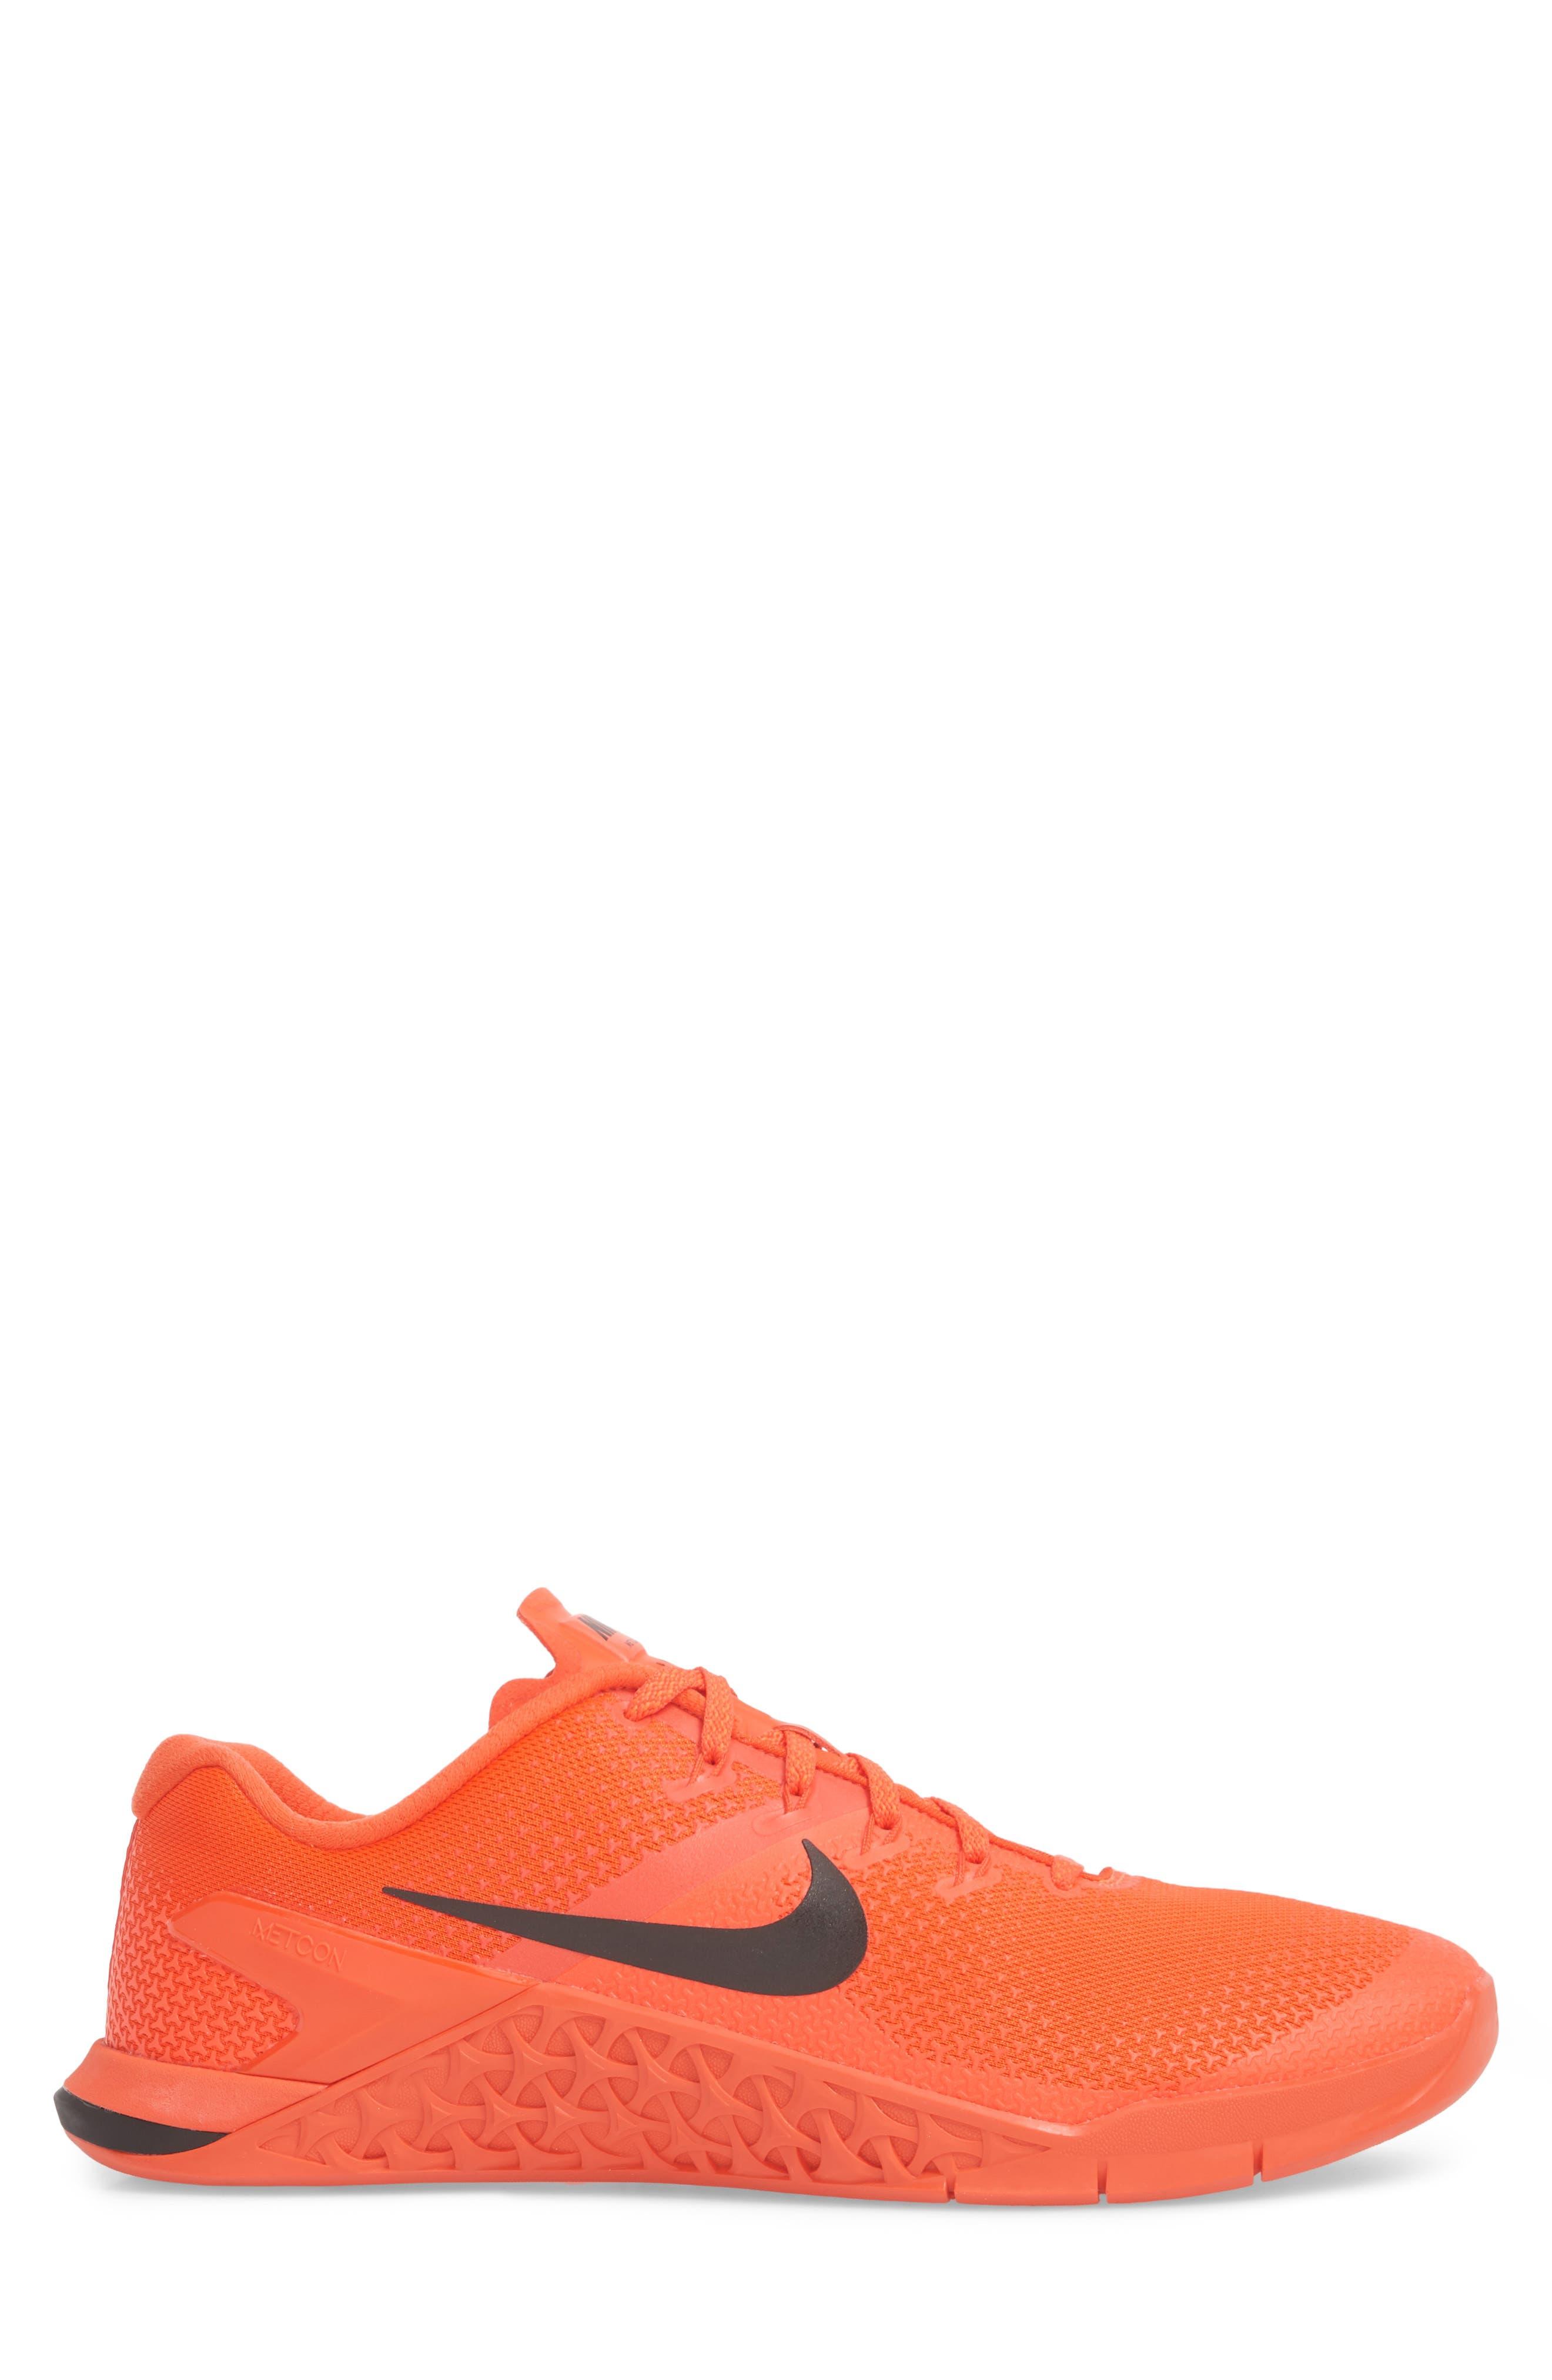 Metcon 4 Training Shoe,                             Alternate thumbnail 50, color,